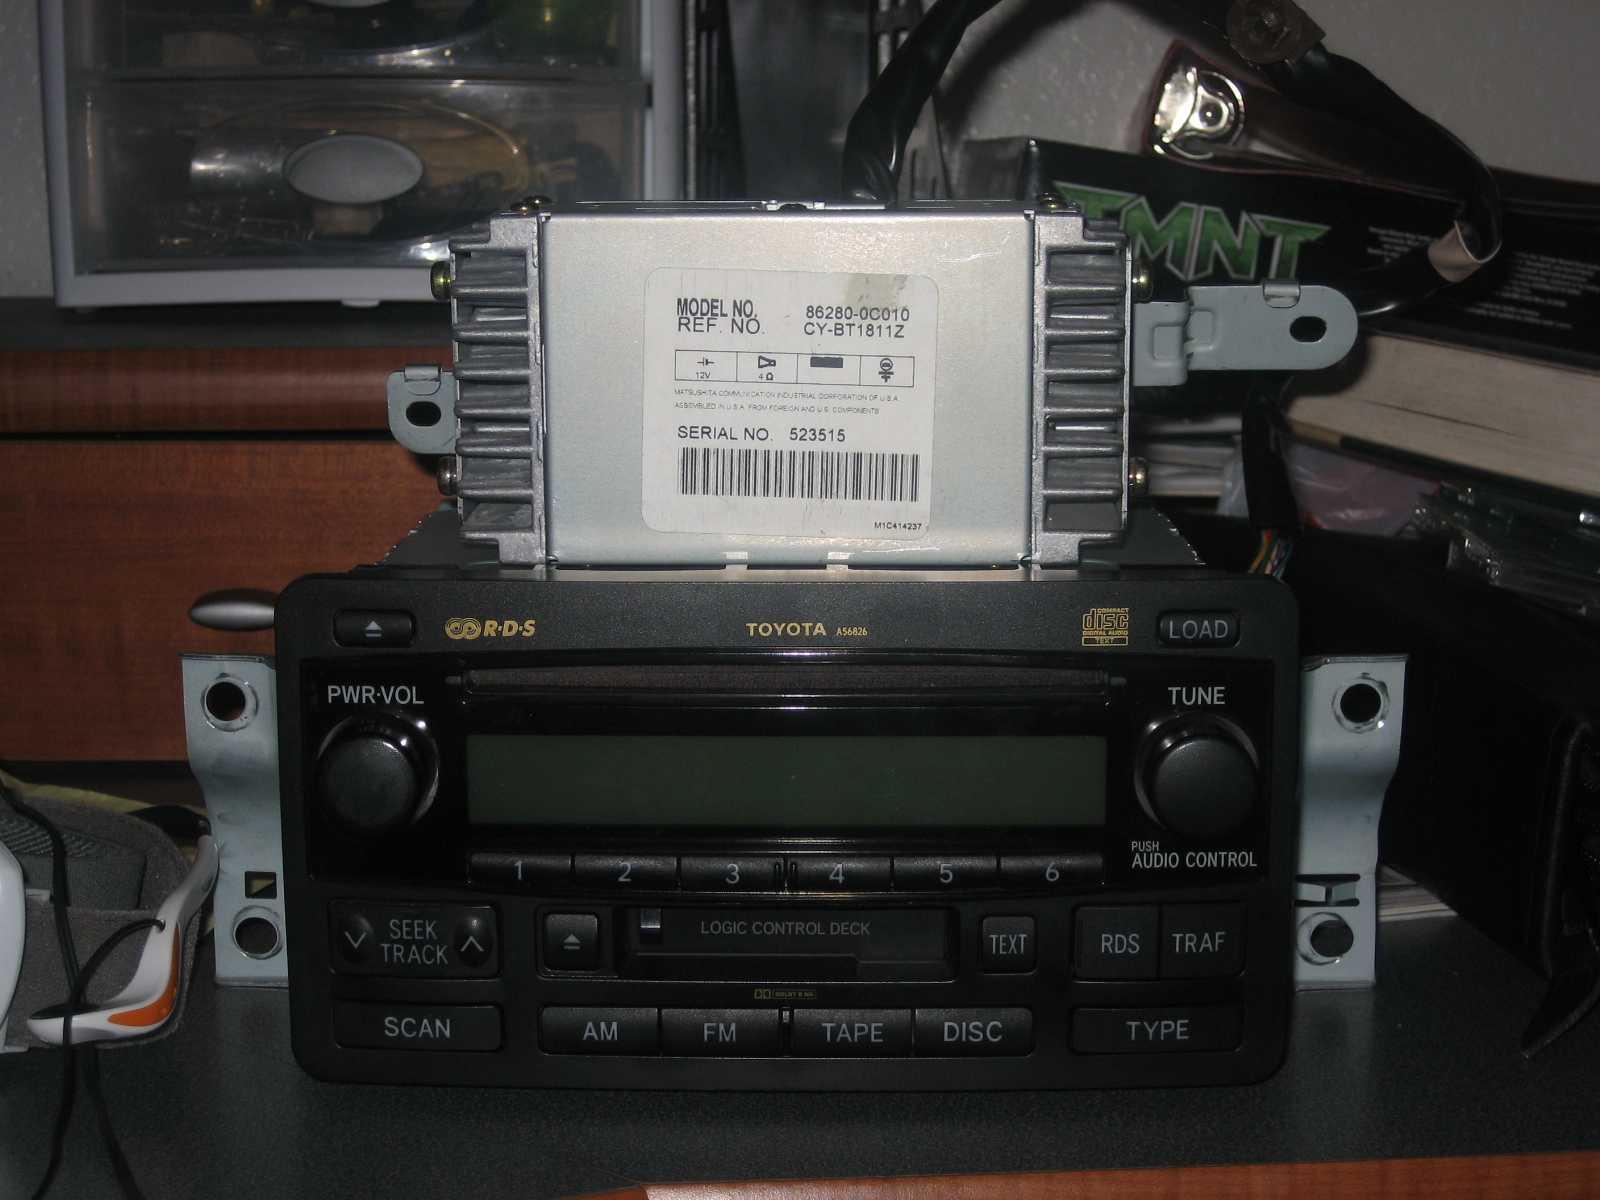 2003 Toyota Tacoma Radio Wiring Diagram from www.tundrasolutions.com